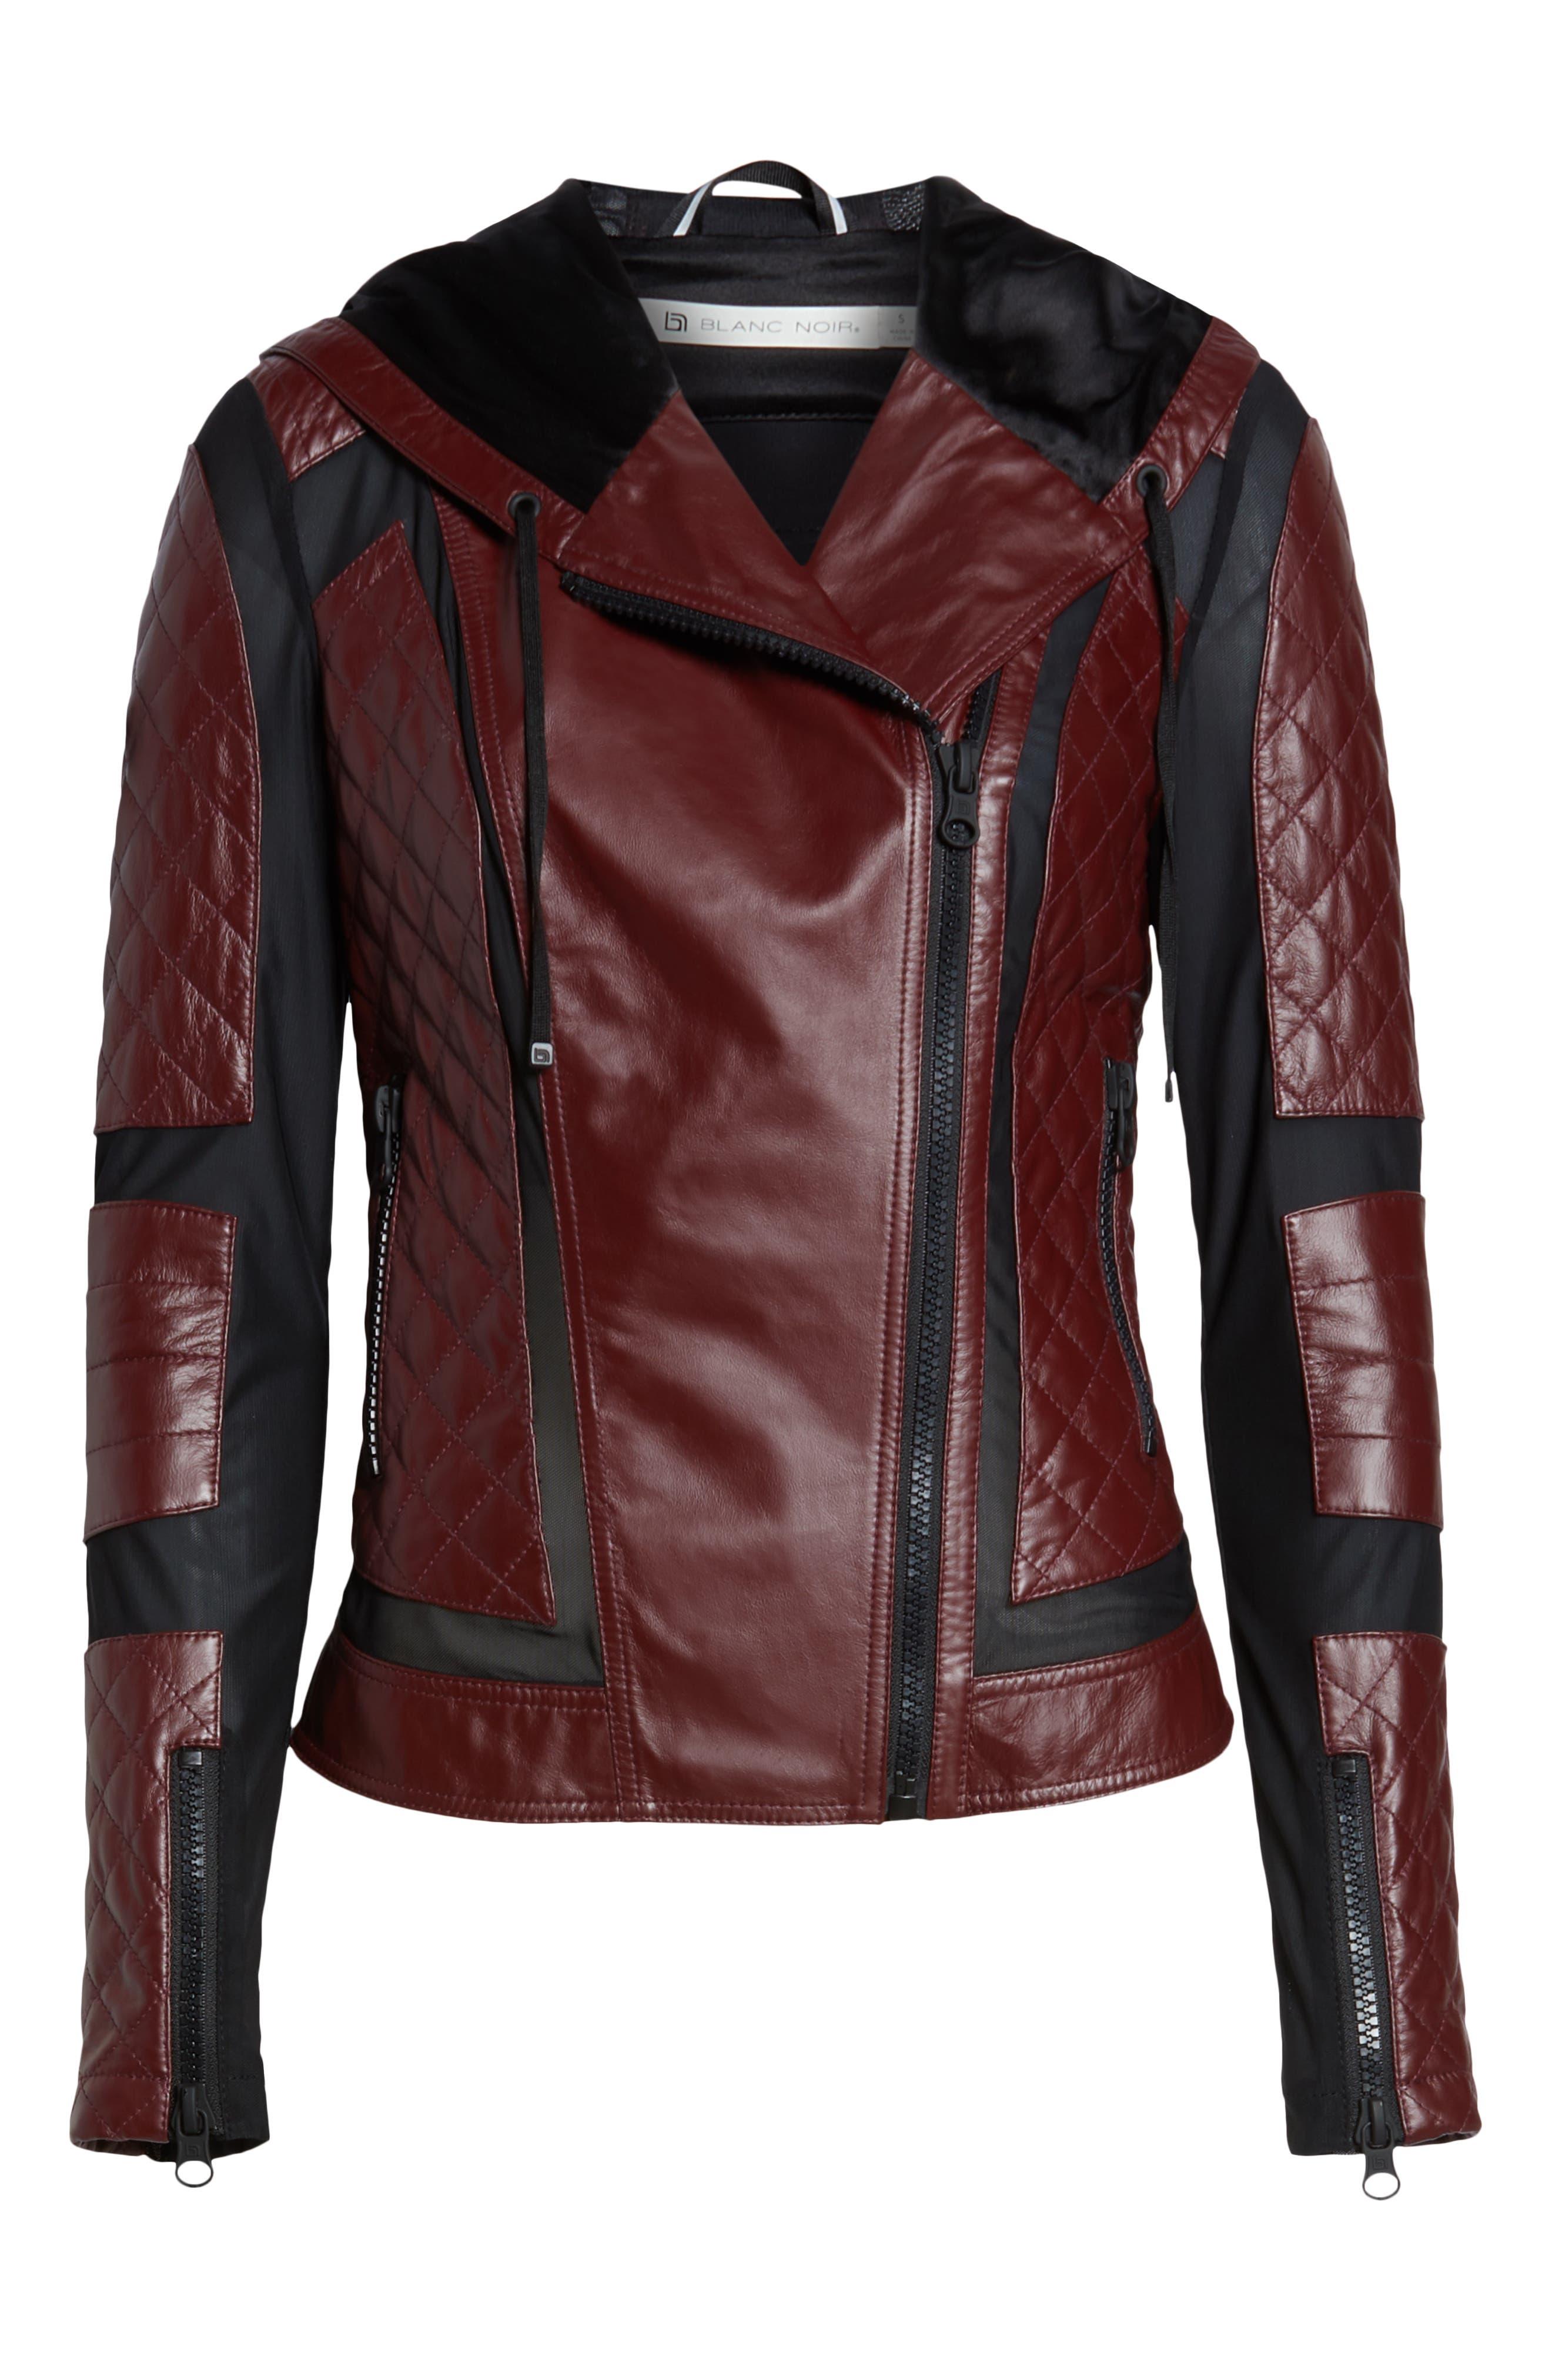 BLANC NOIR, Voyage Hooded Leather & Mesh Moto Jacket, Alternate thumbnail 6, color, 601